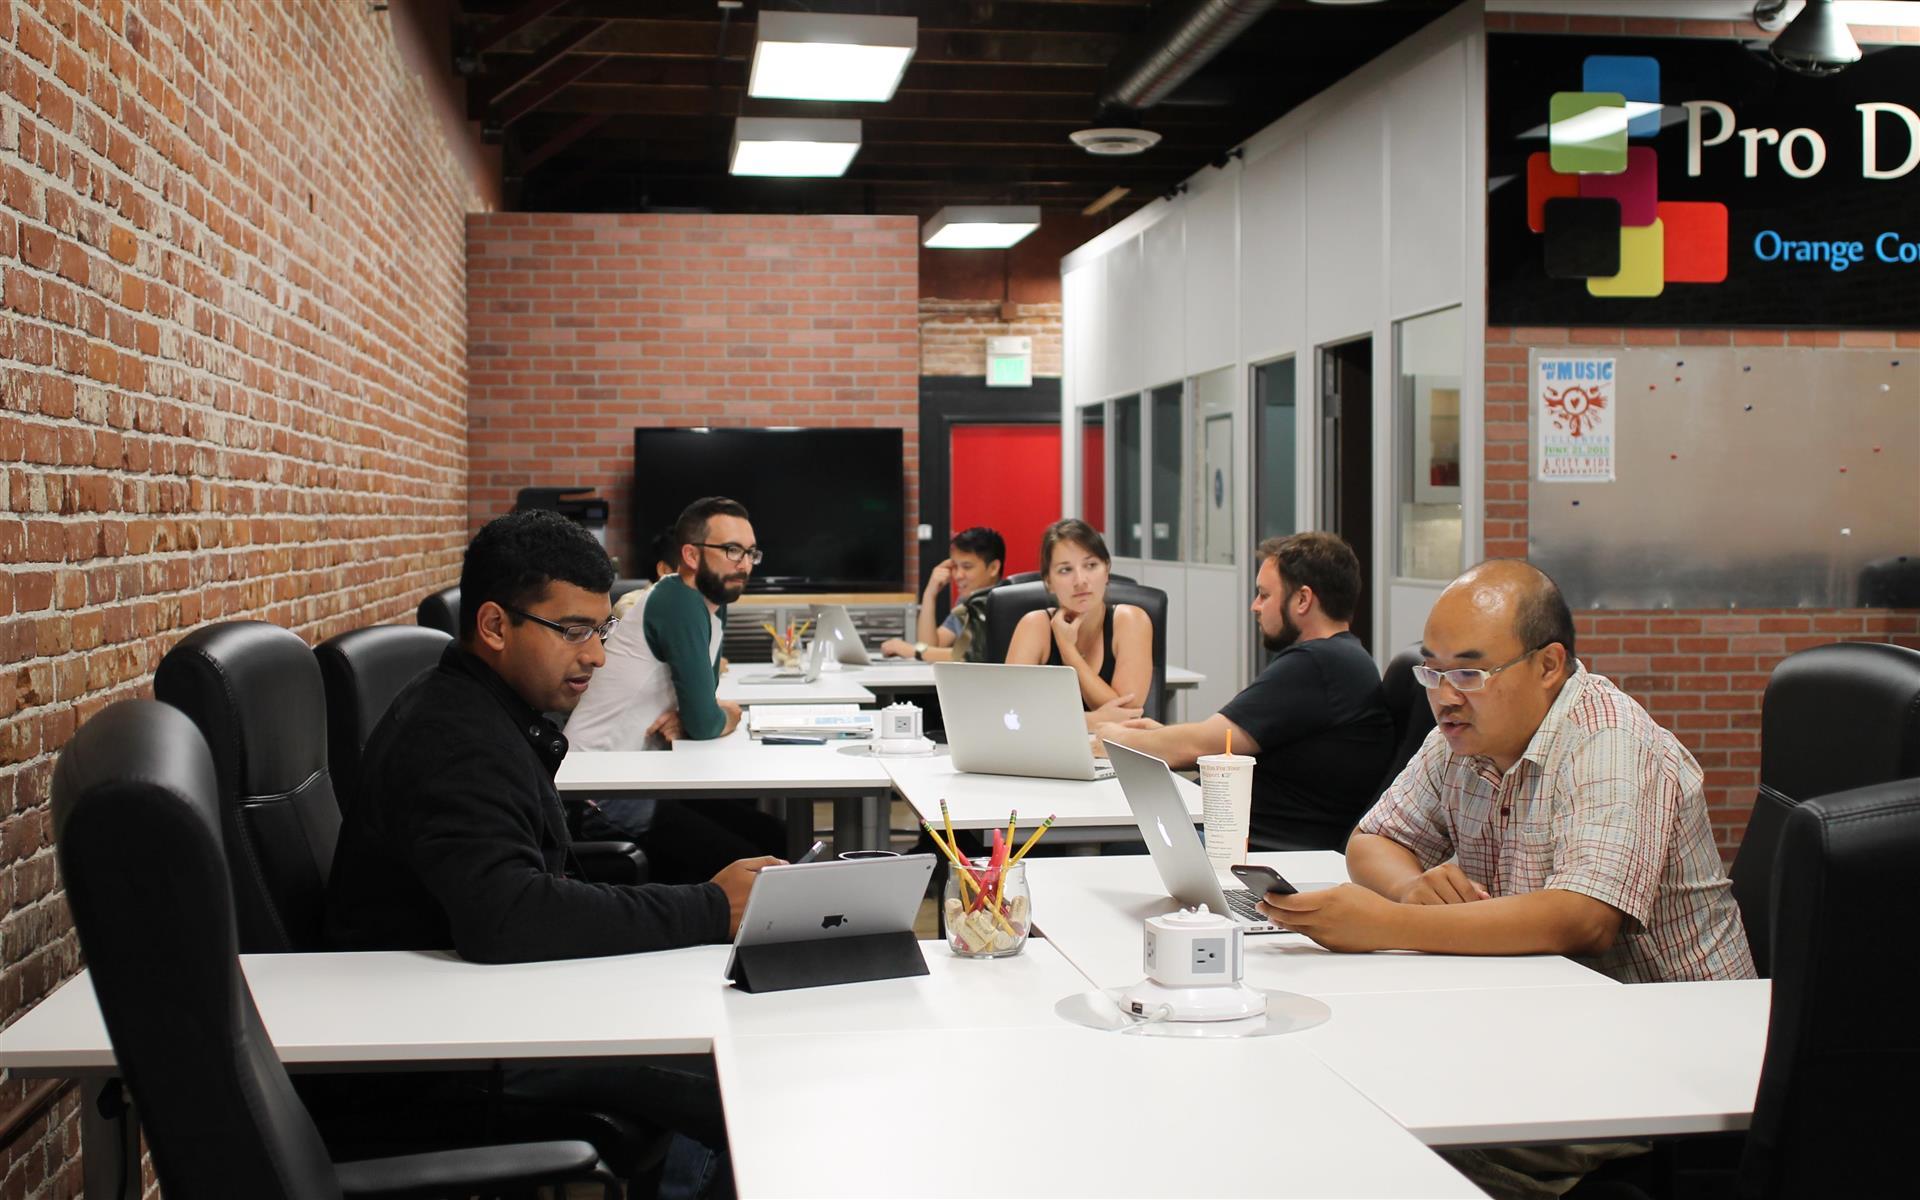 Pro Desk Space - Open Desk - 1 Day Pass